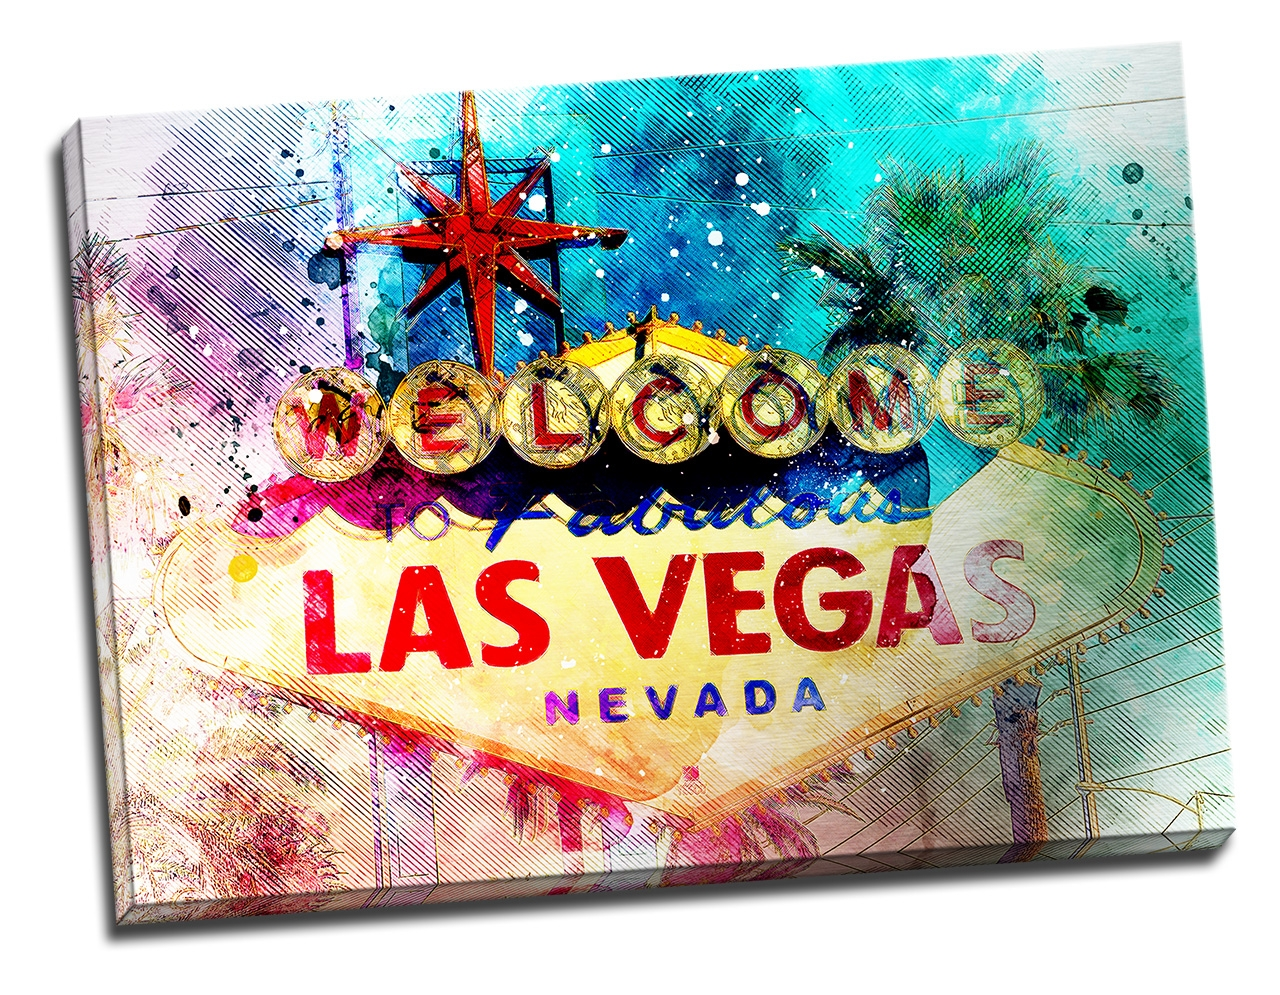 Tablou din aluminiu striat Welcome to Las Vegas